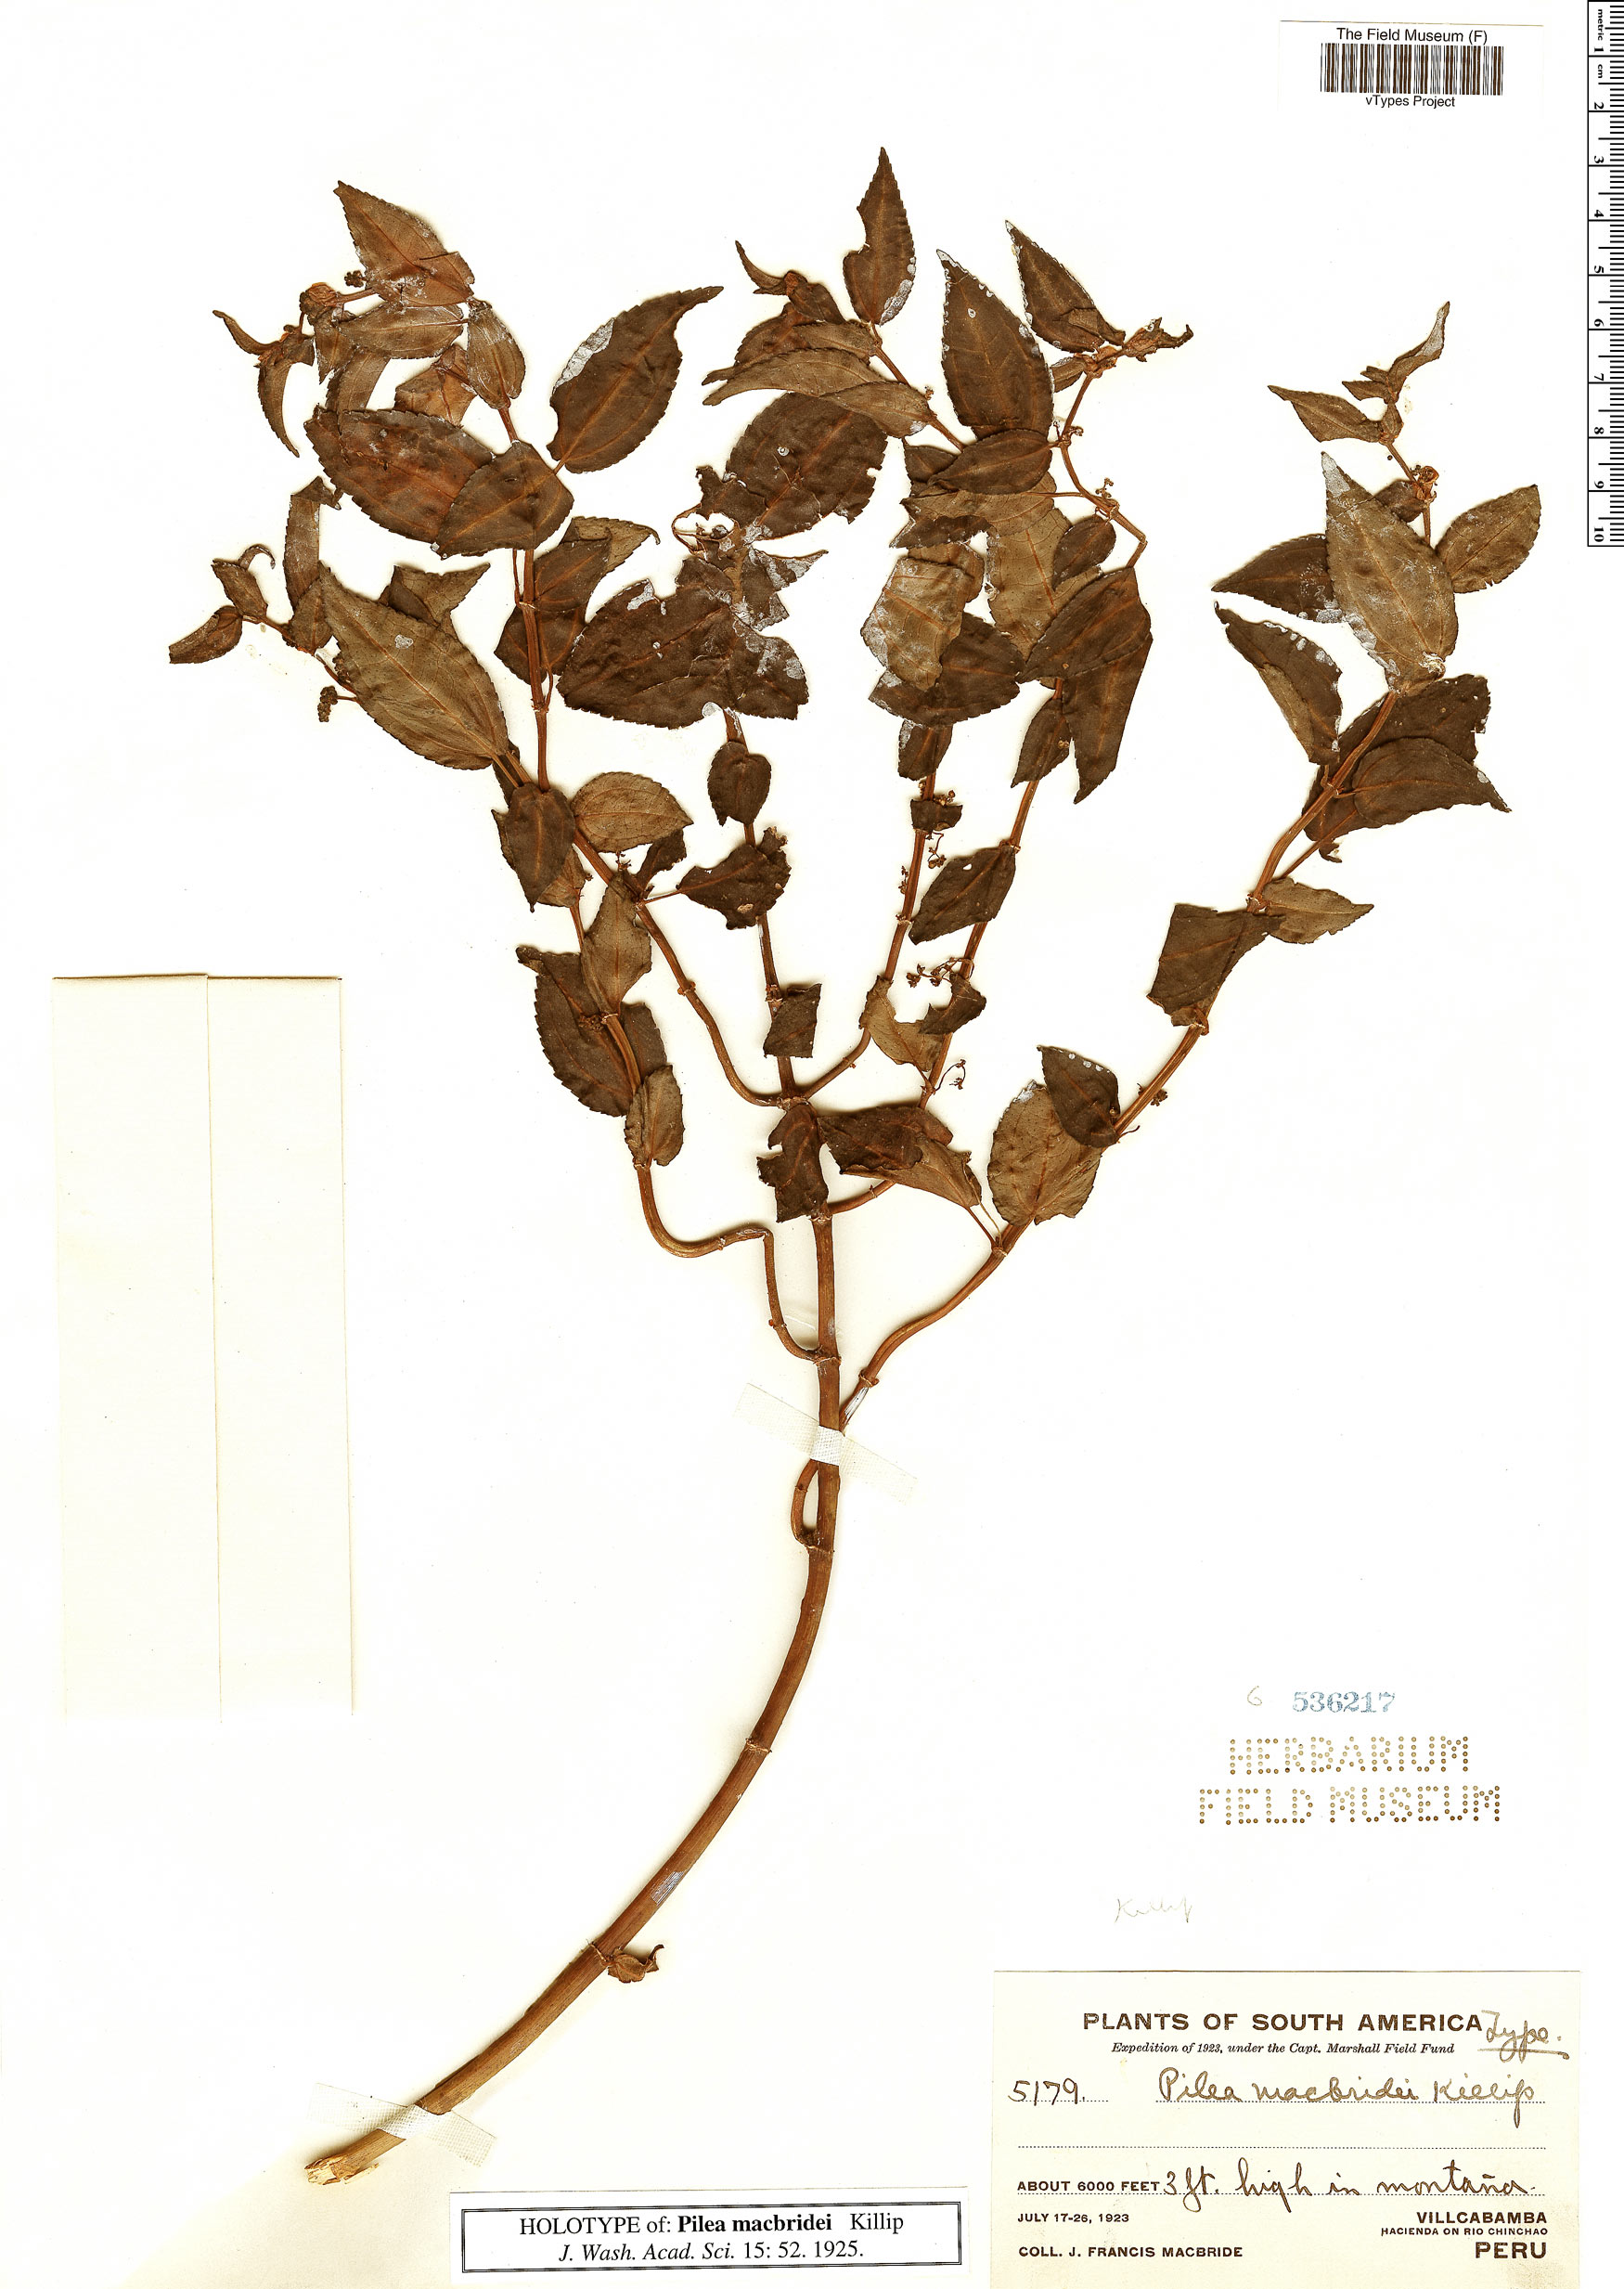 Specimen: Pilea macbridei